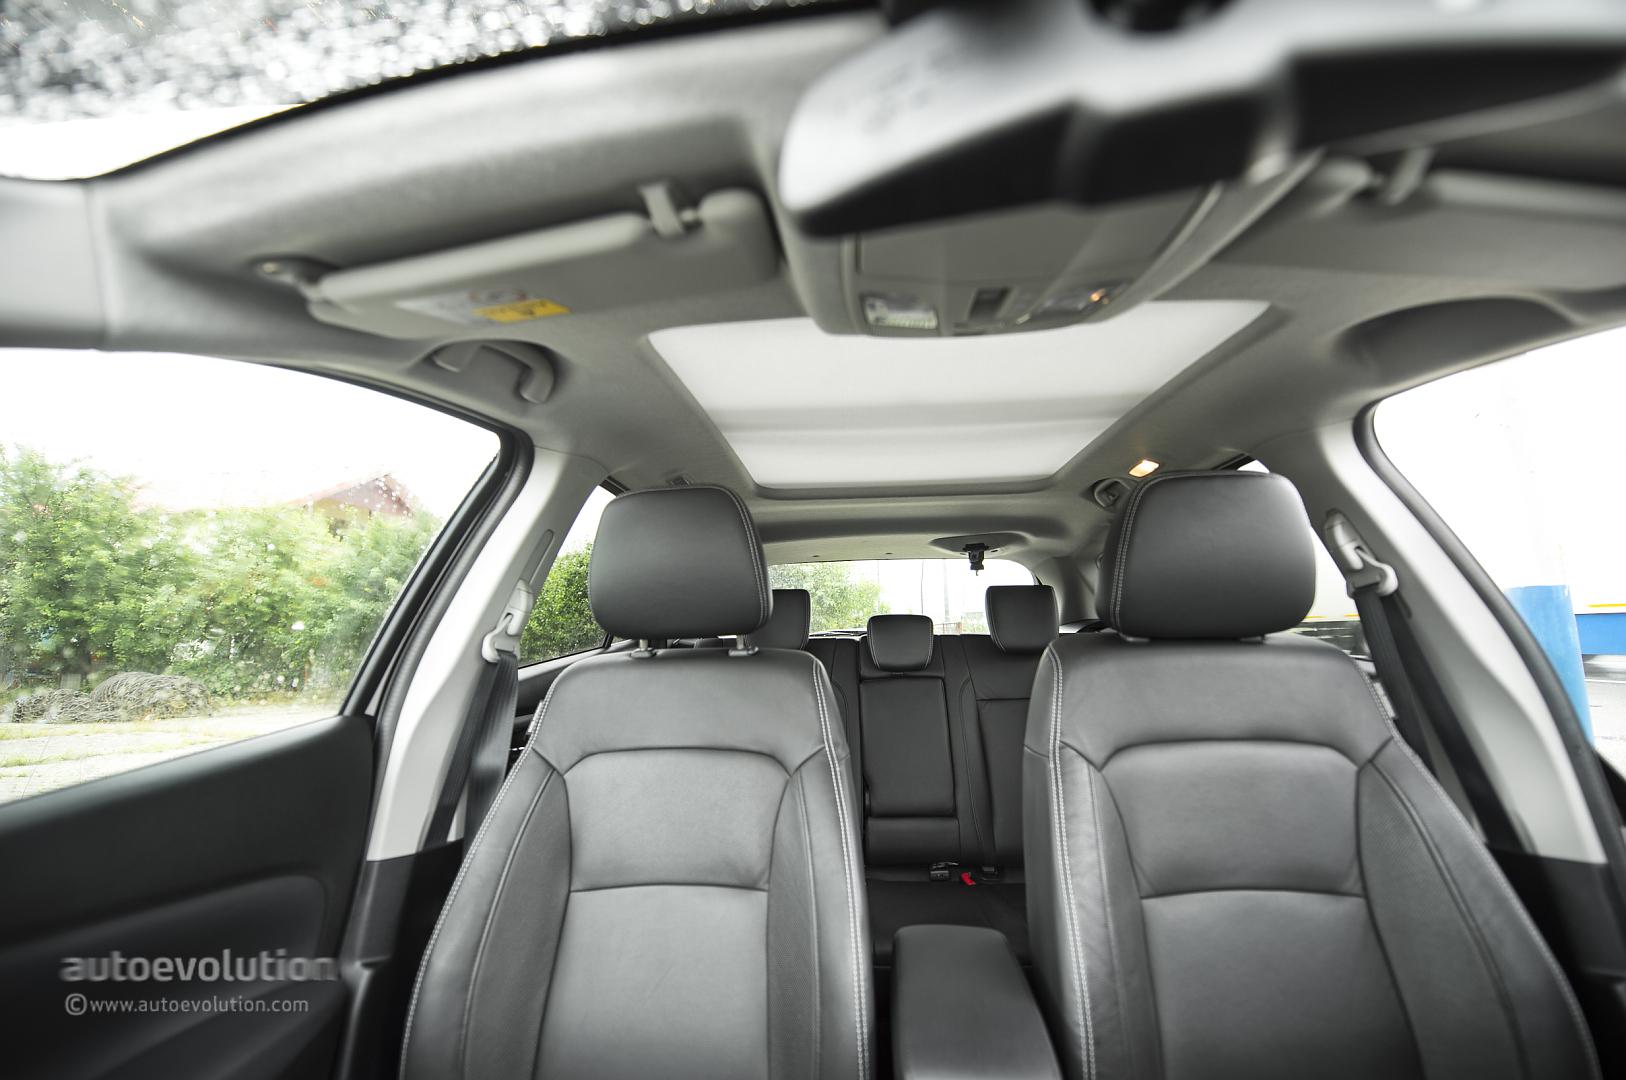 M Drive Reviews >> Suzuki SX4 S-Cross Review - autoevolution